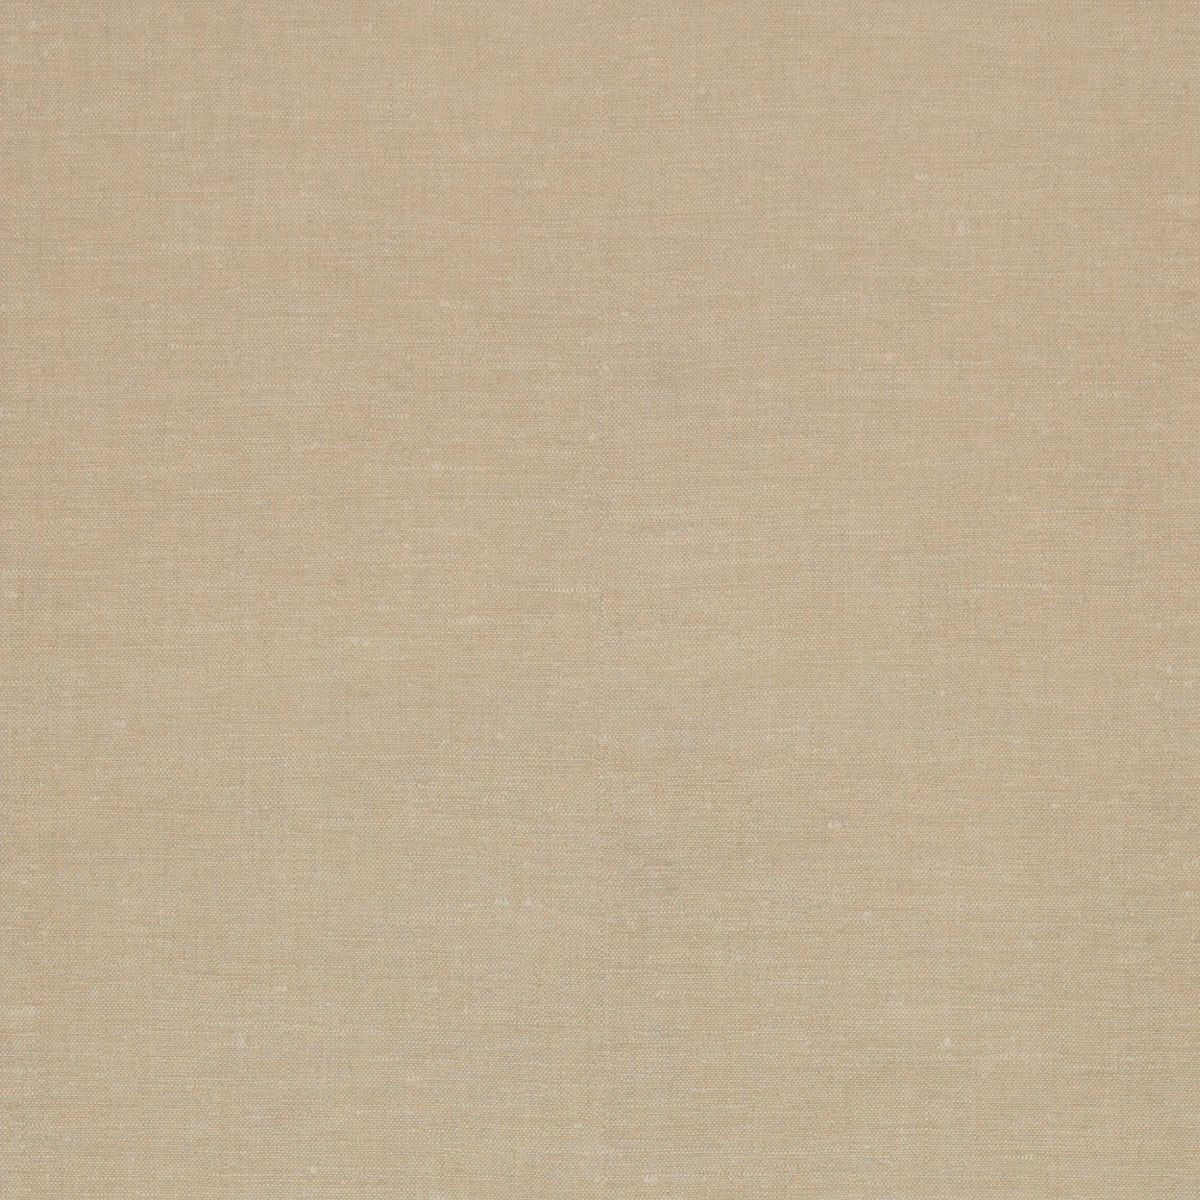 hochwertige tapeten und stoffe b n wallcoverings vliestapete riviera maison 18346 decowunder. Black Bedroom Furniture Sets. Home Design Ideas